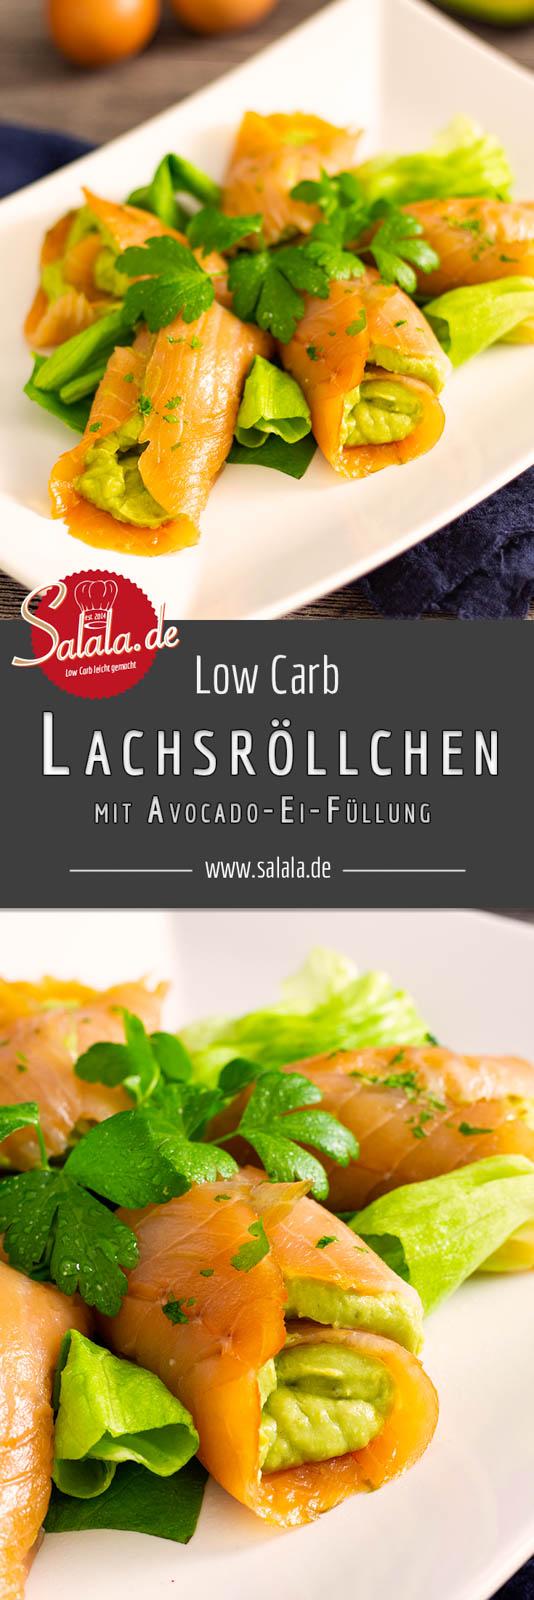 #keto #ketorezepte #lachs #lachsröllchen #avocado #rezeptemitavocado #lowcarb